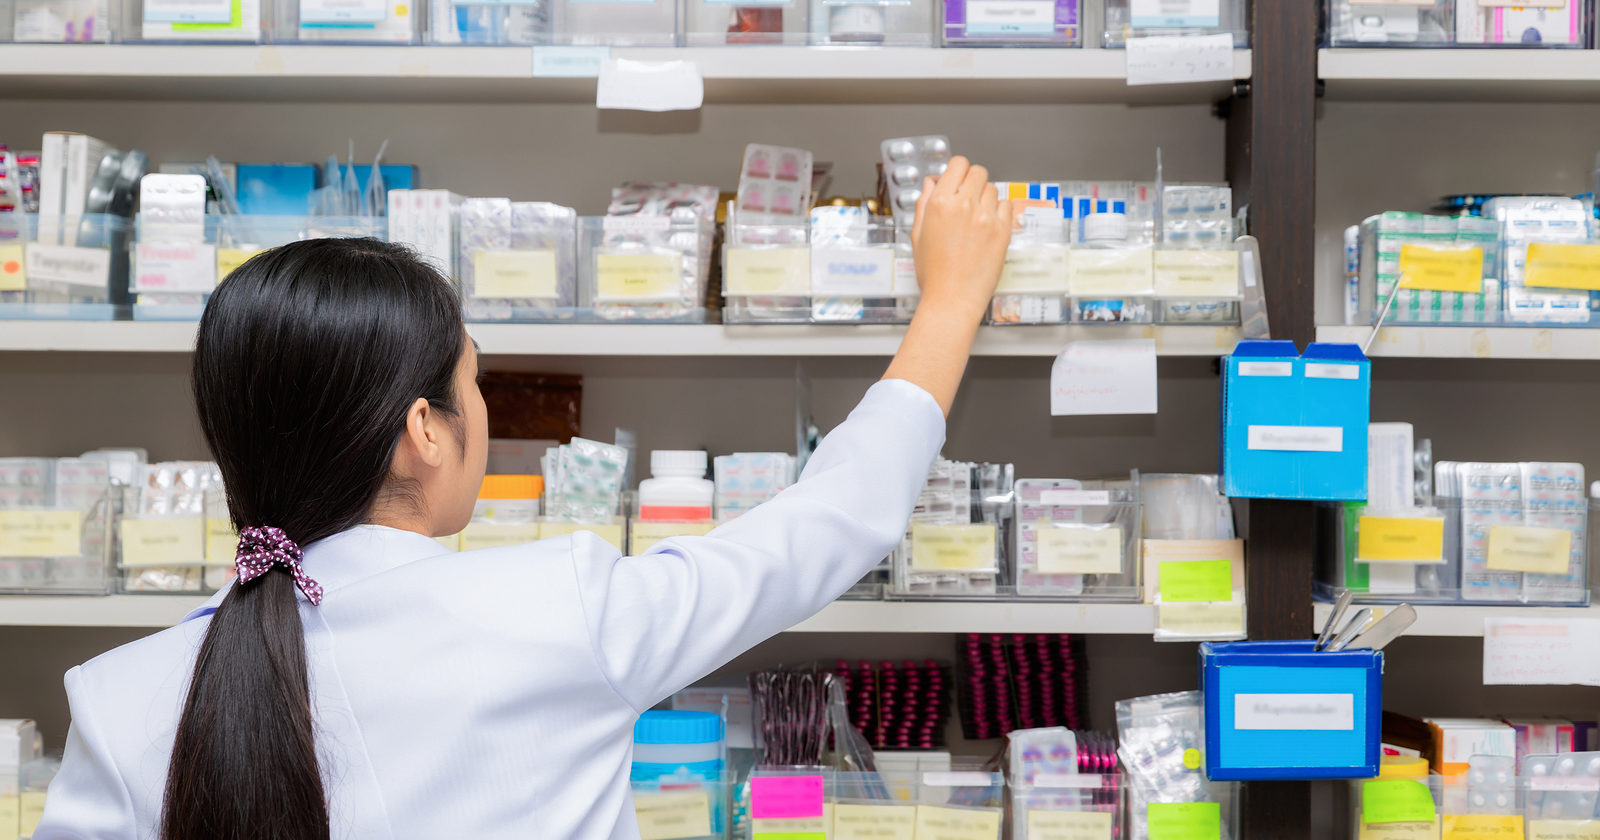 Pills on the Shelf of a Pharmacy